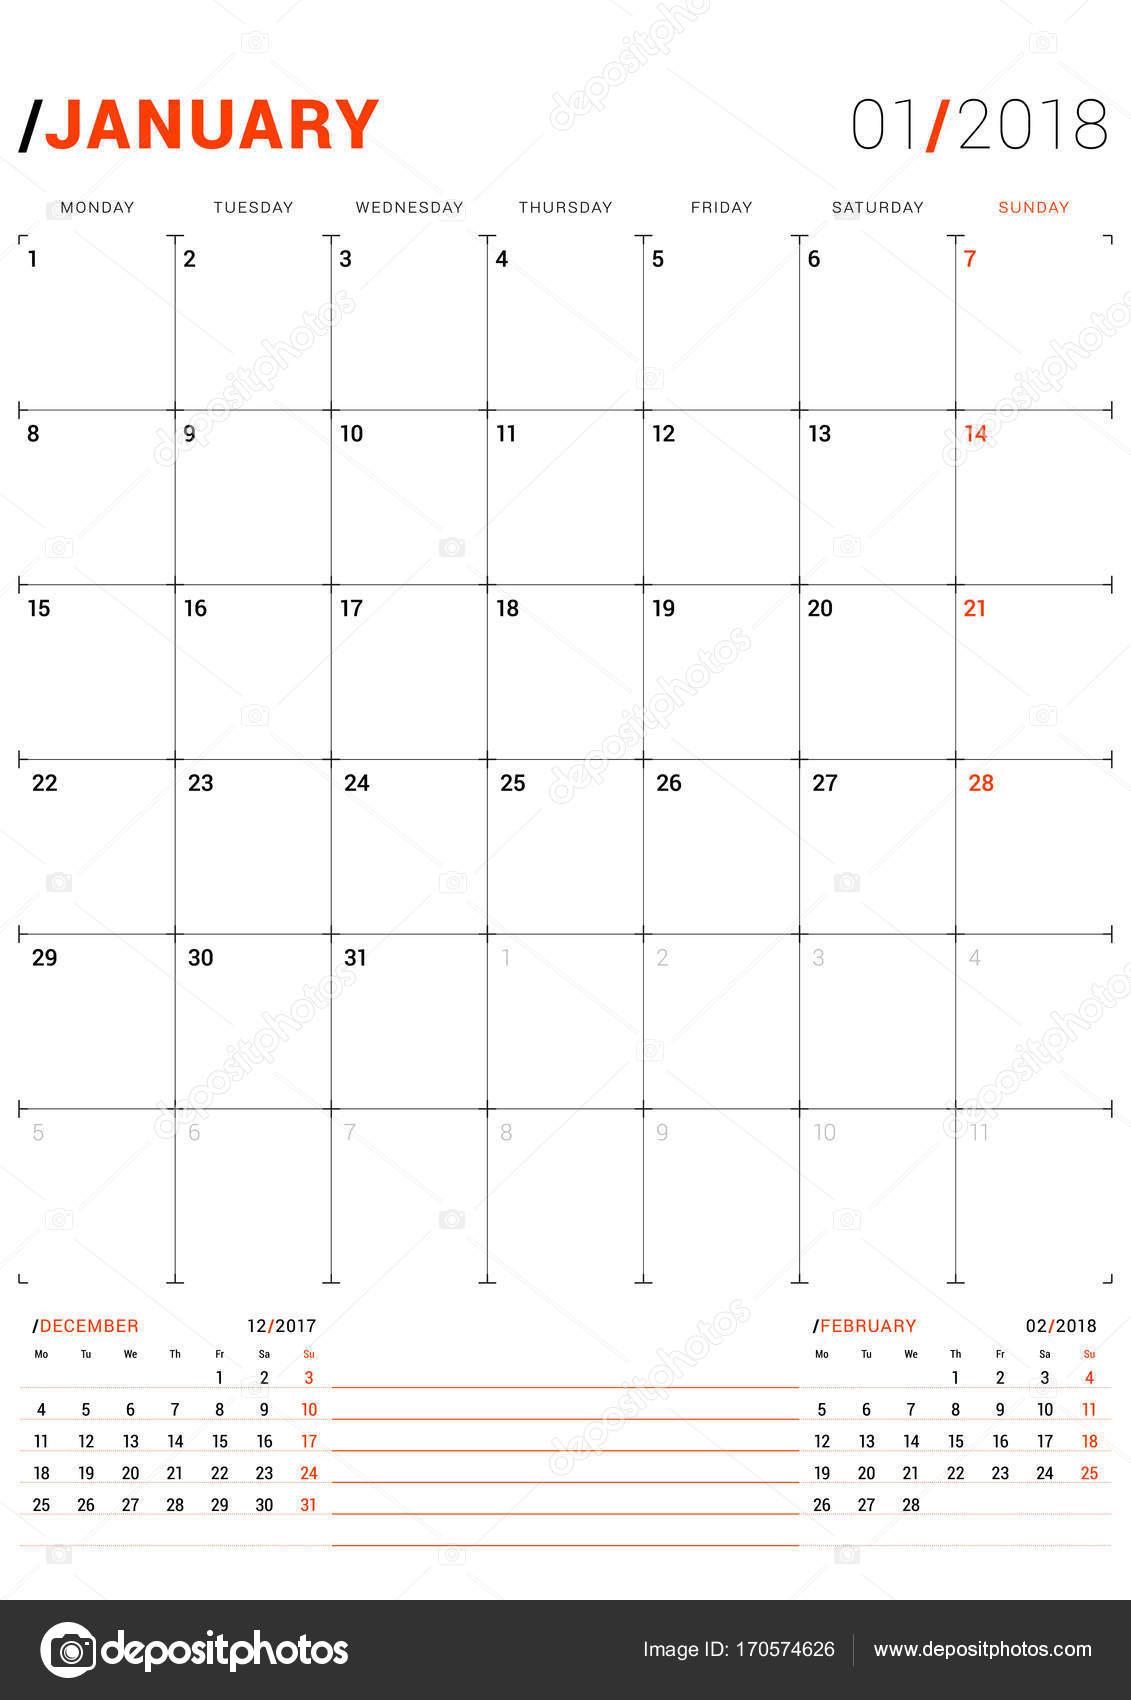 calendar template july 2018 enom warb co